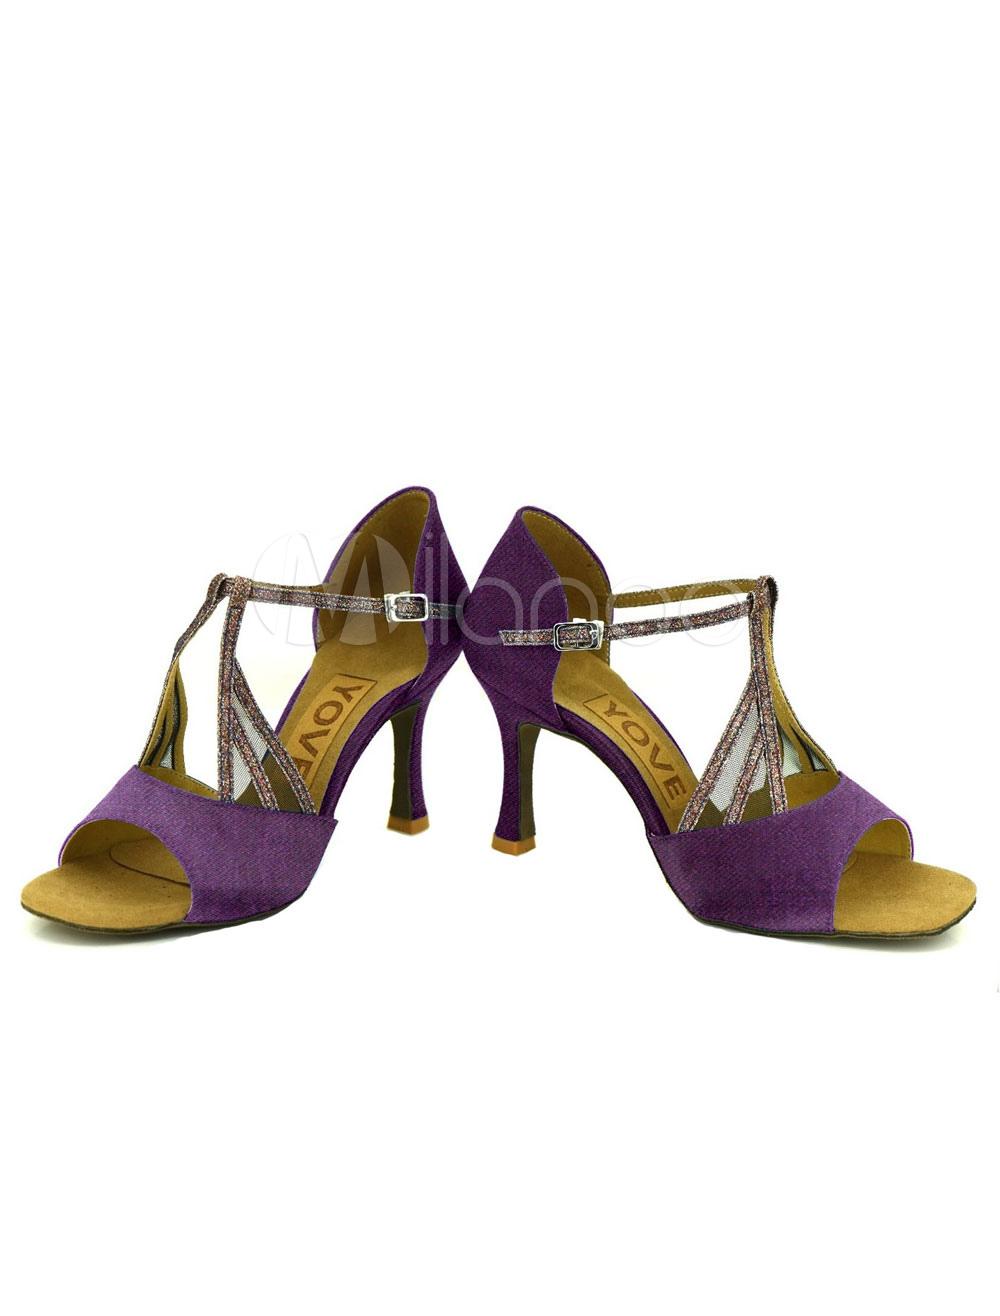 Zapatos de bailes latinos de satén color liso a medidas L02MMRYA0c